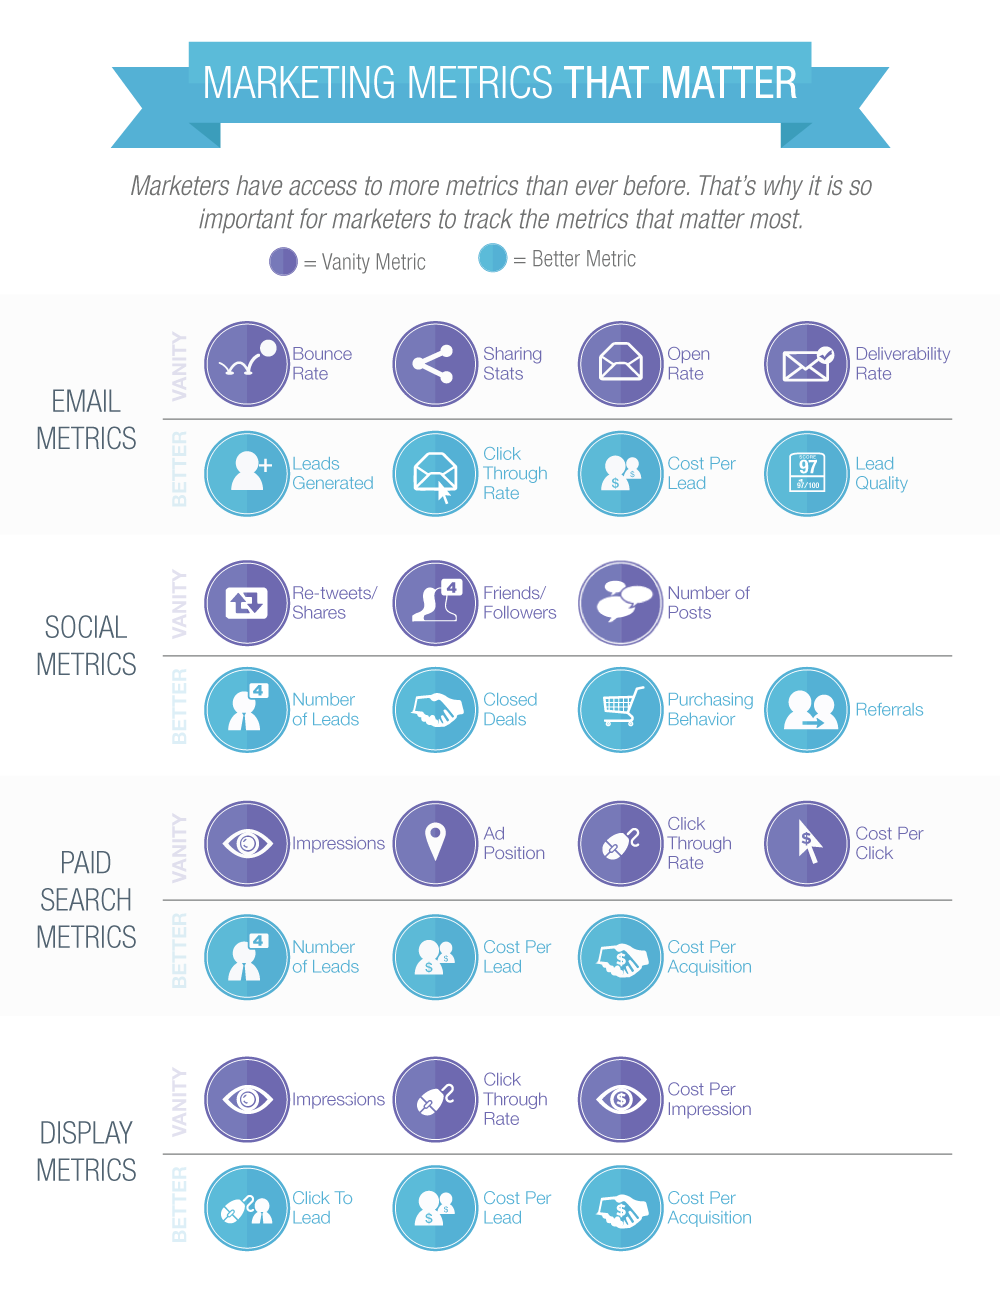 Marketing-Metrics-That-Matter-infographic